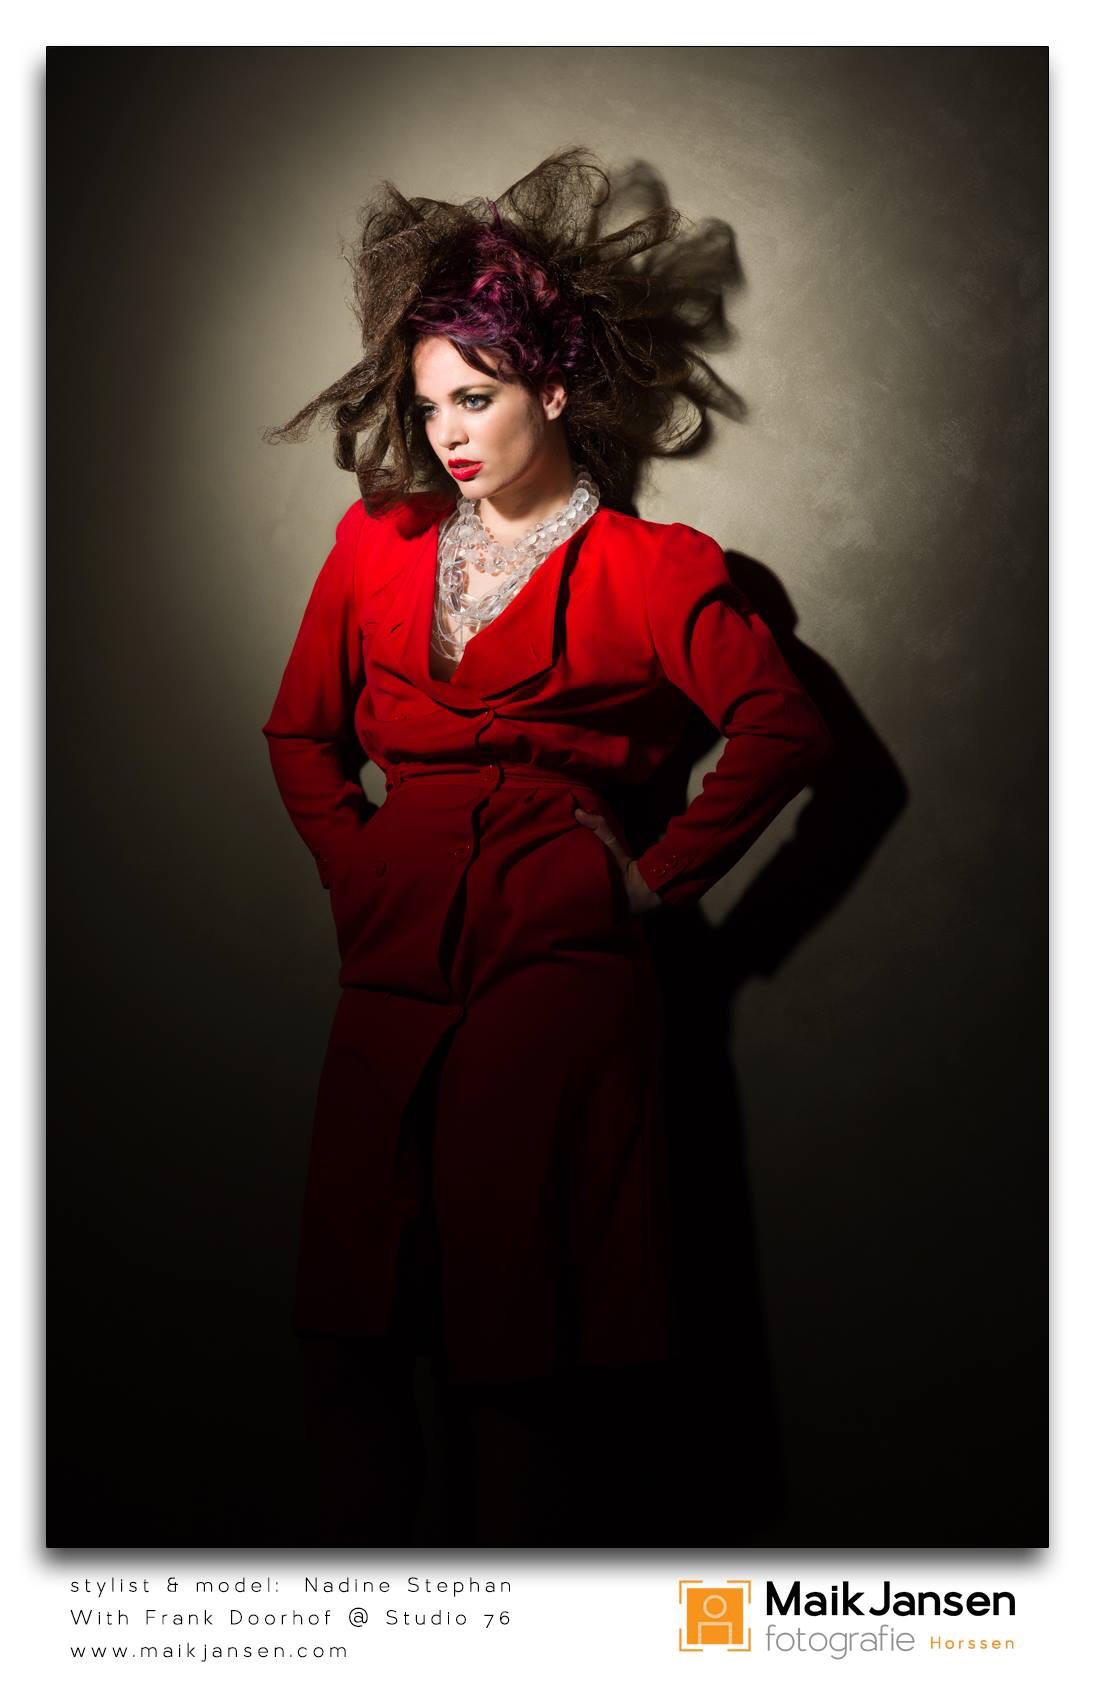 Fashion Model & Stylist Nadine Stephan.